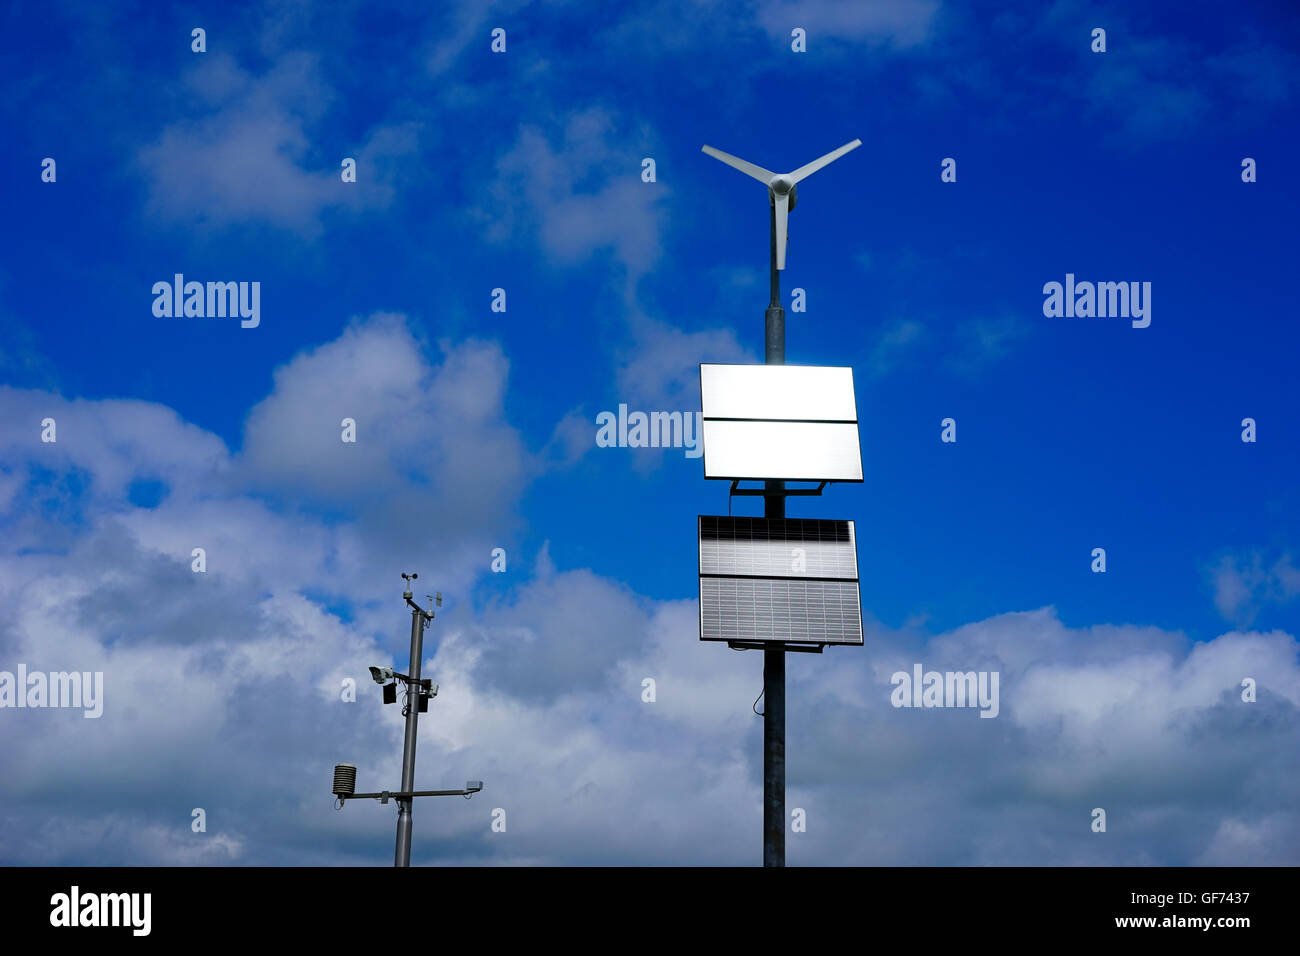 Estación de Monitoreo meteorológico automático alimentado por paneles solares,Scottish Borders, Escocia, Imagen De Stock